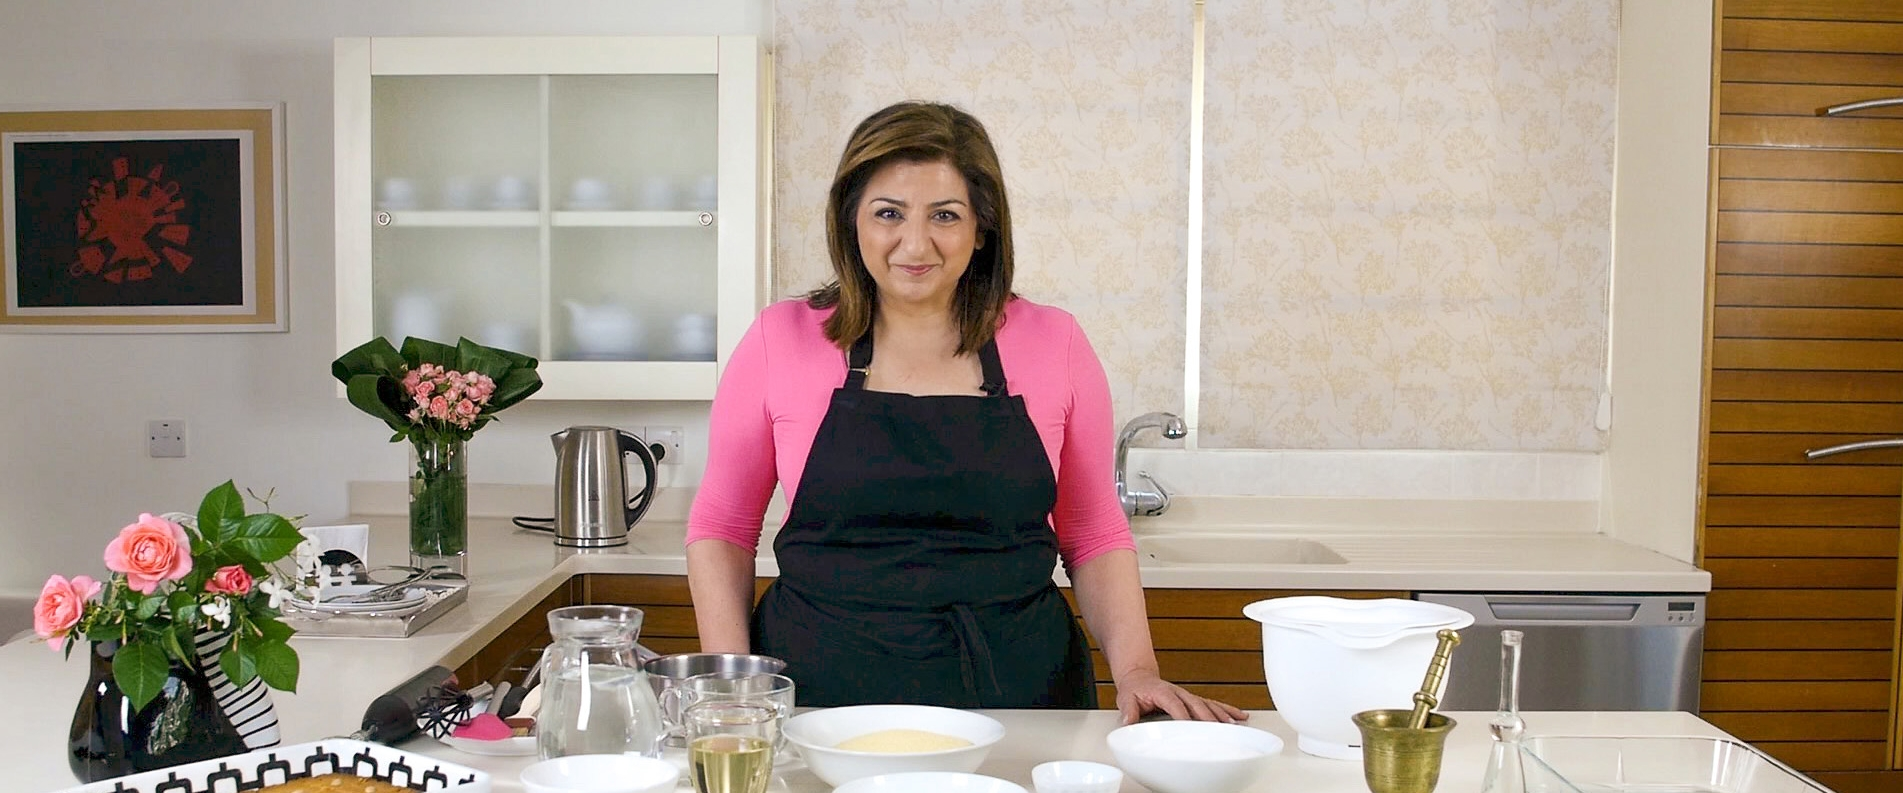 Cyprus cuisine with Marilena: shamali cake